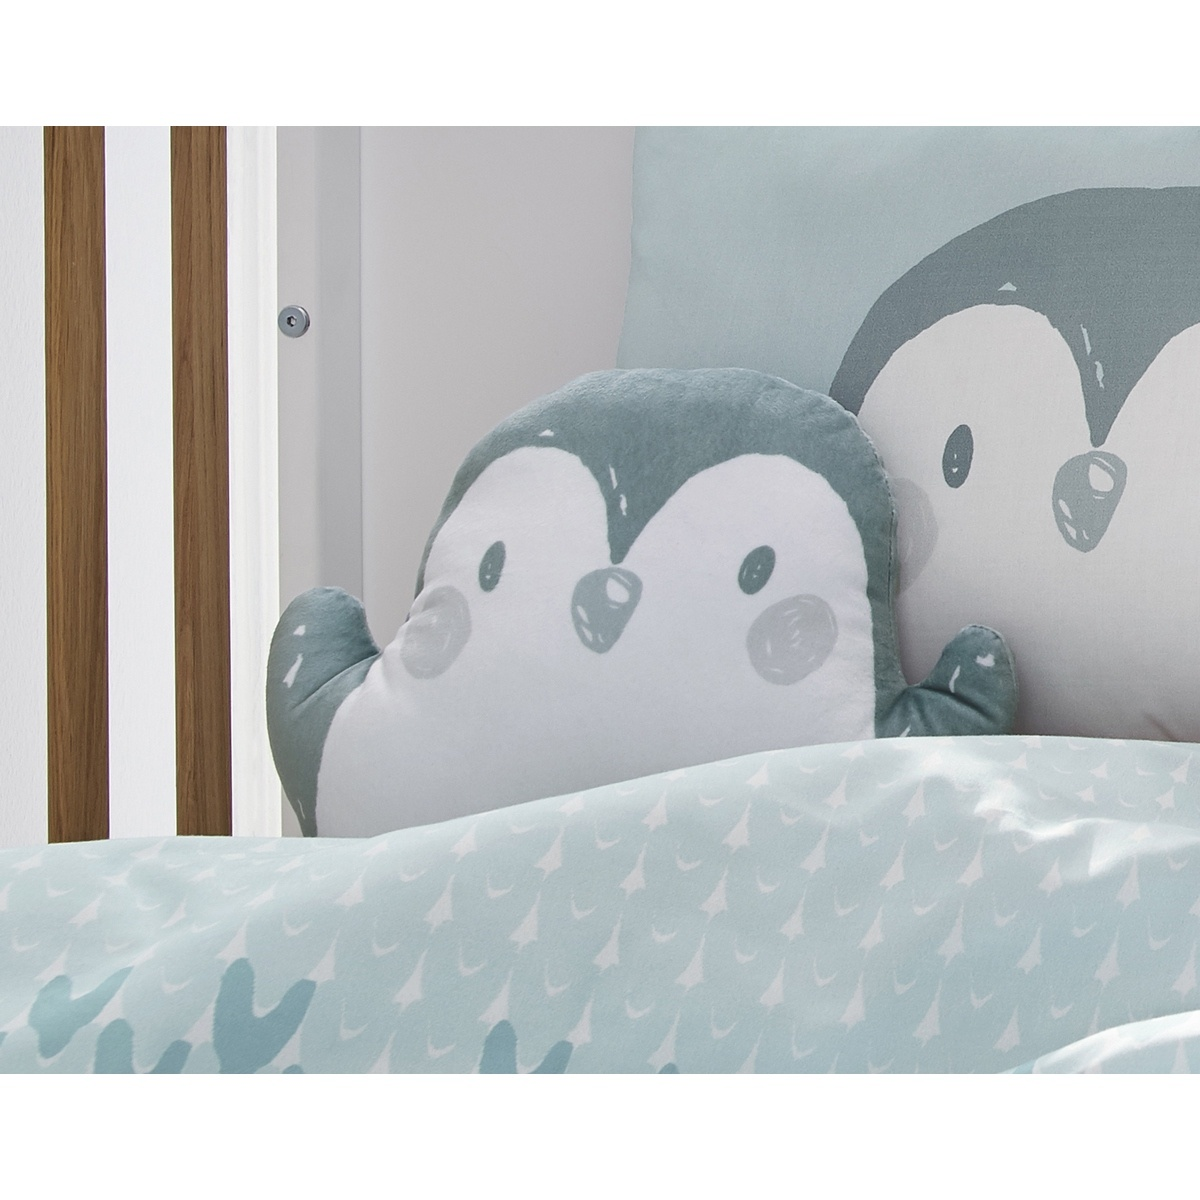 s.Oliver Tvarovaný polštářek Pinguin 7393/610, 33 x 20 cm